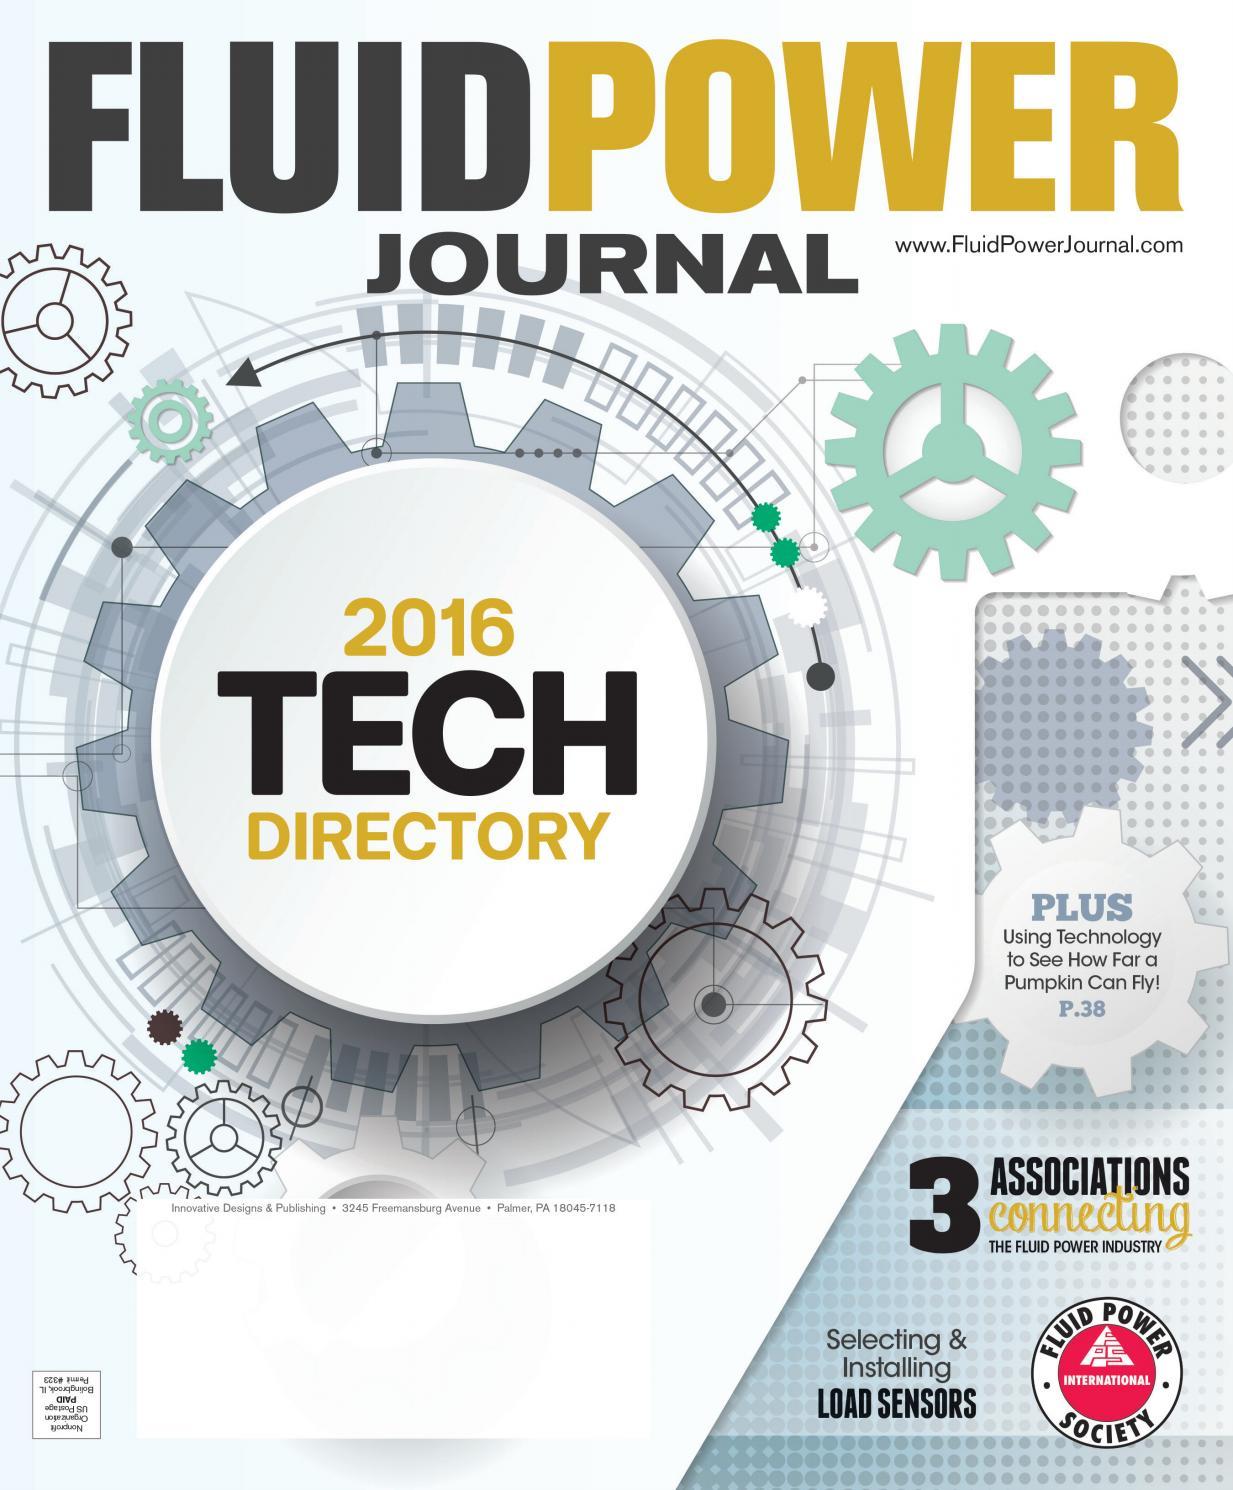 Fluid Power Journal Tech Directory 2016 by Innovative